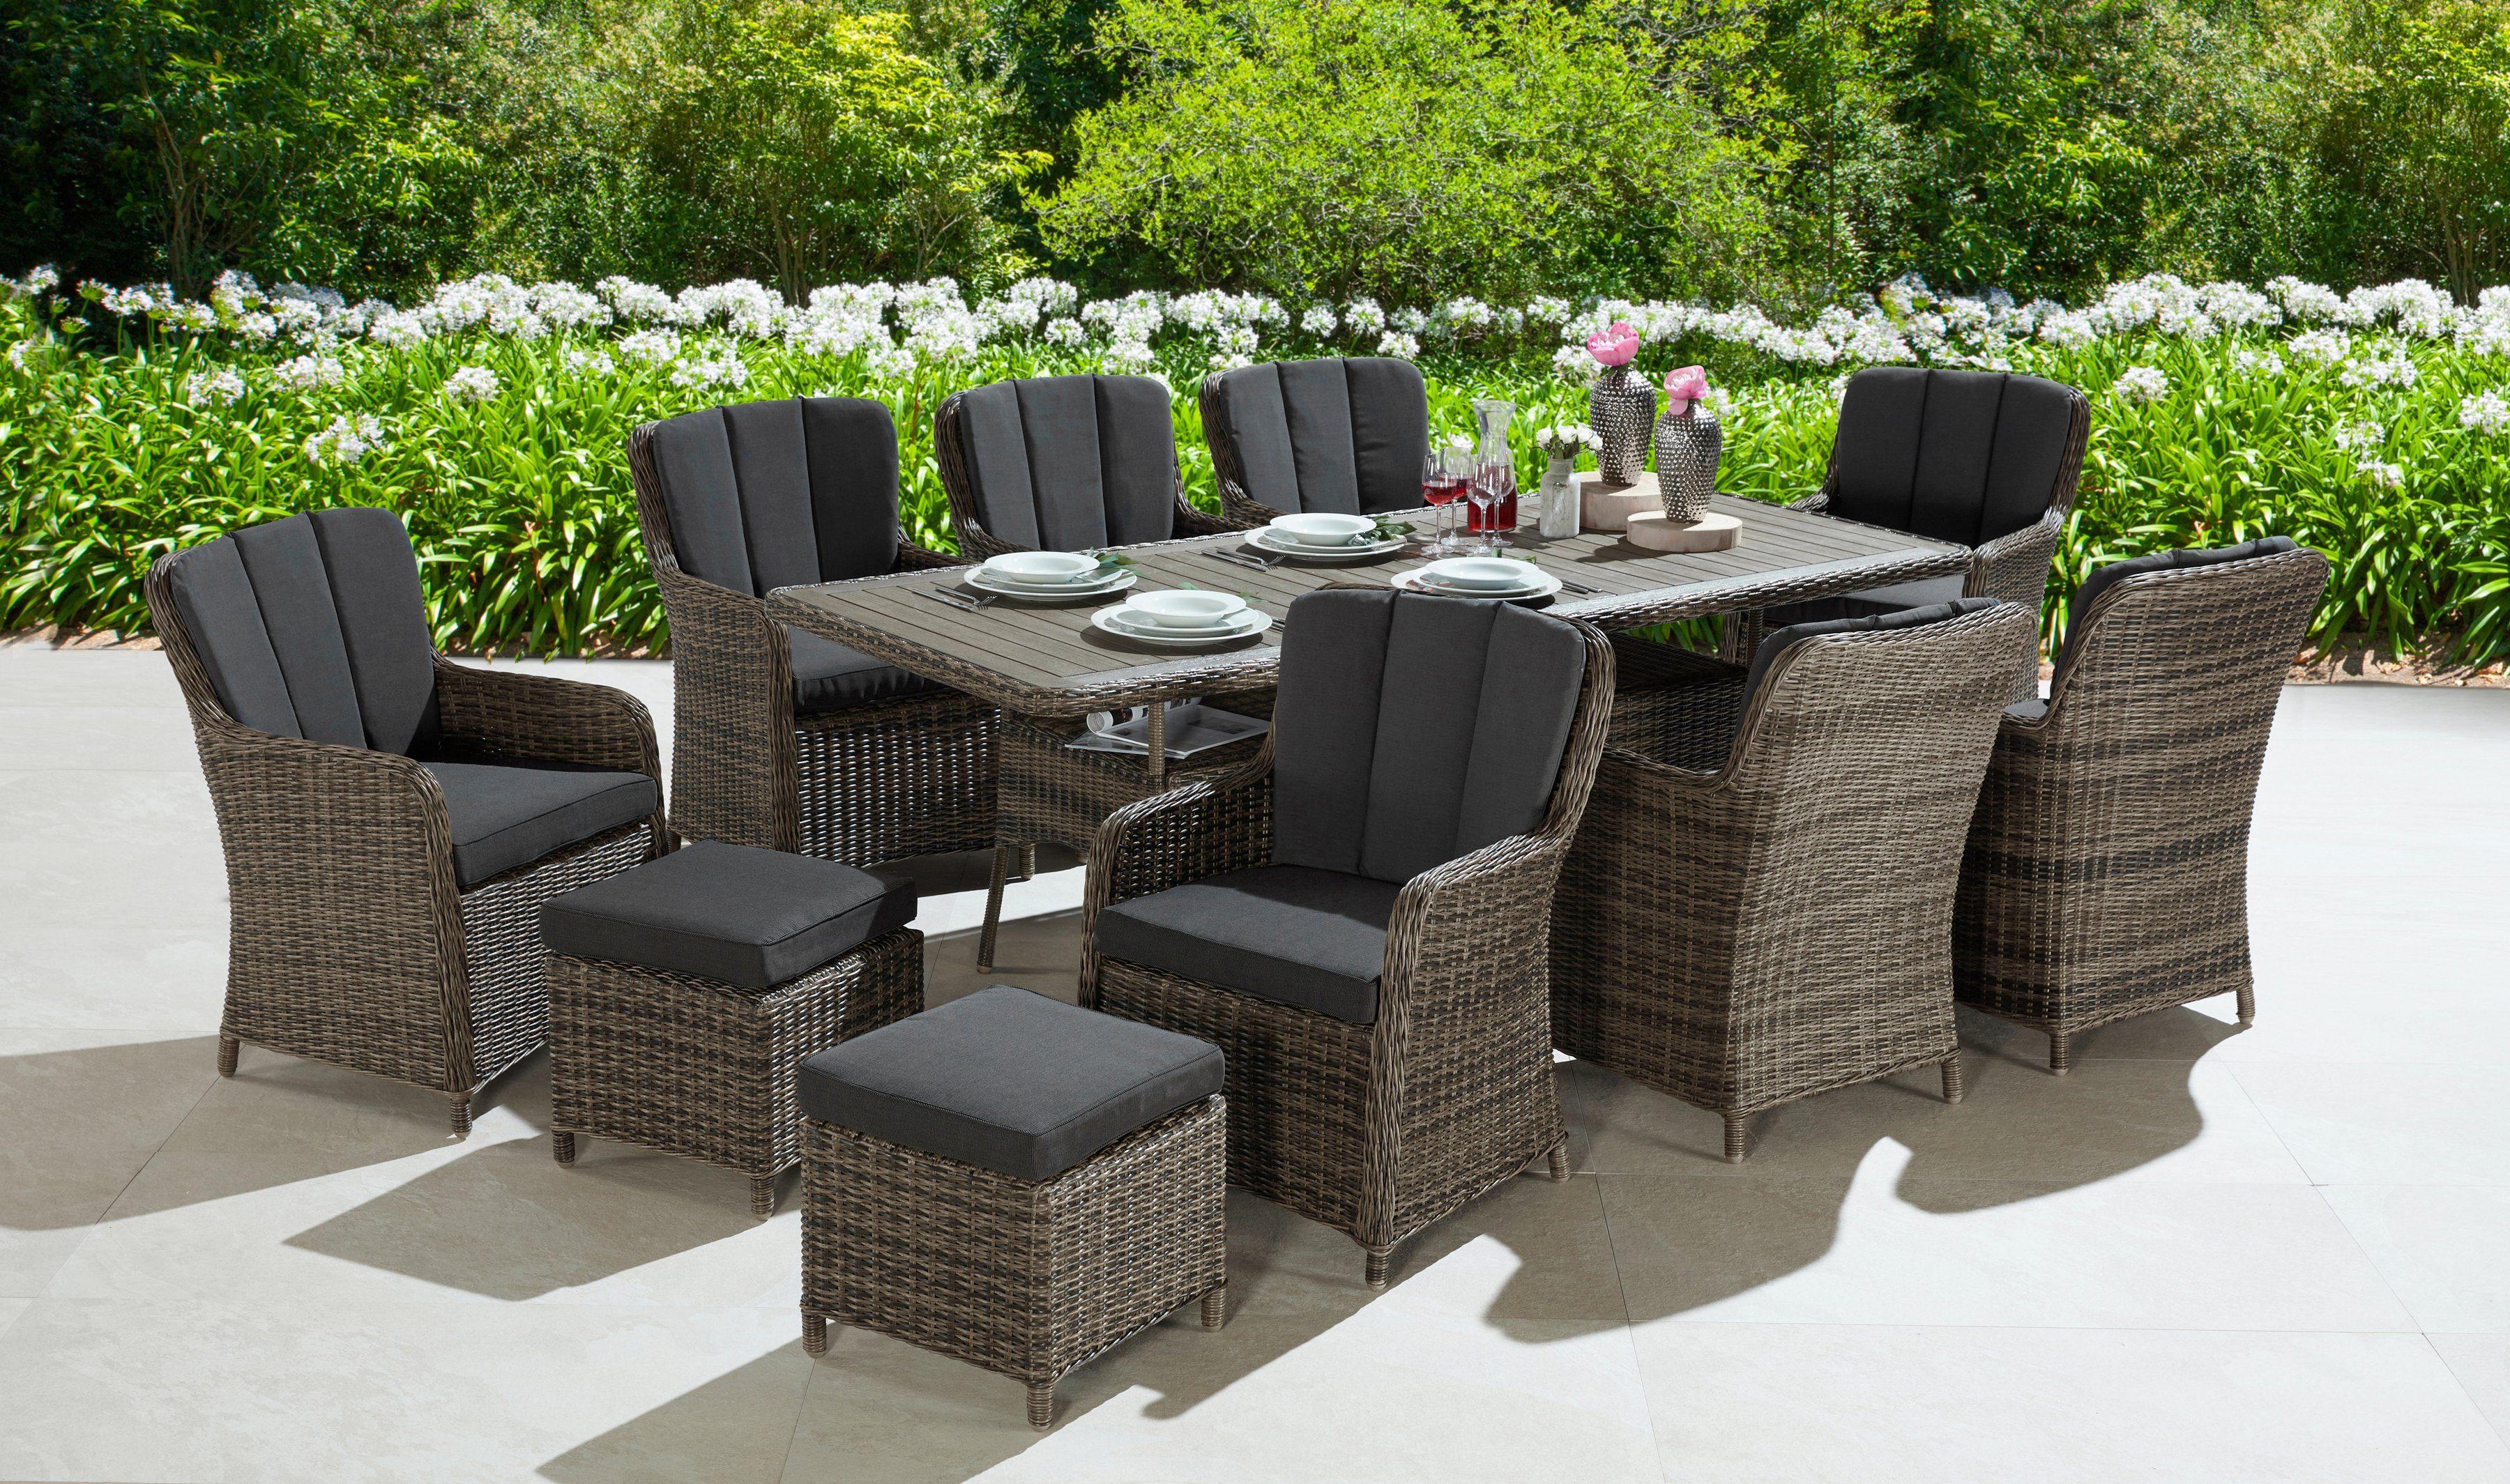 KONIFERA Gartenmöbelset »Kenya«, 29-tlg., 8 Sessel, 2 Hocker, Tisch, Polyrattan/Akazie